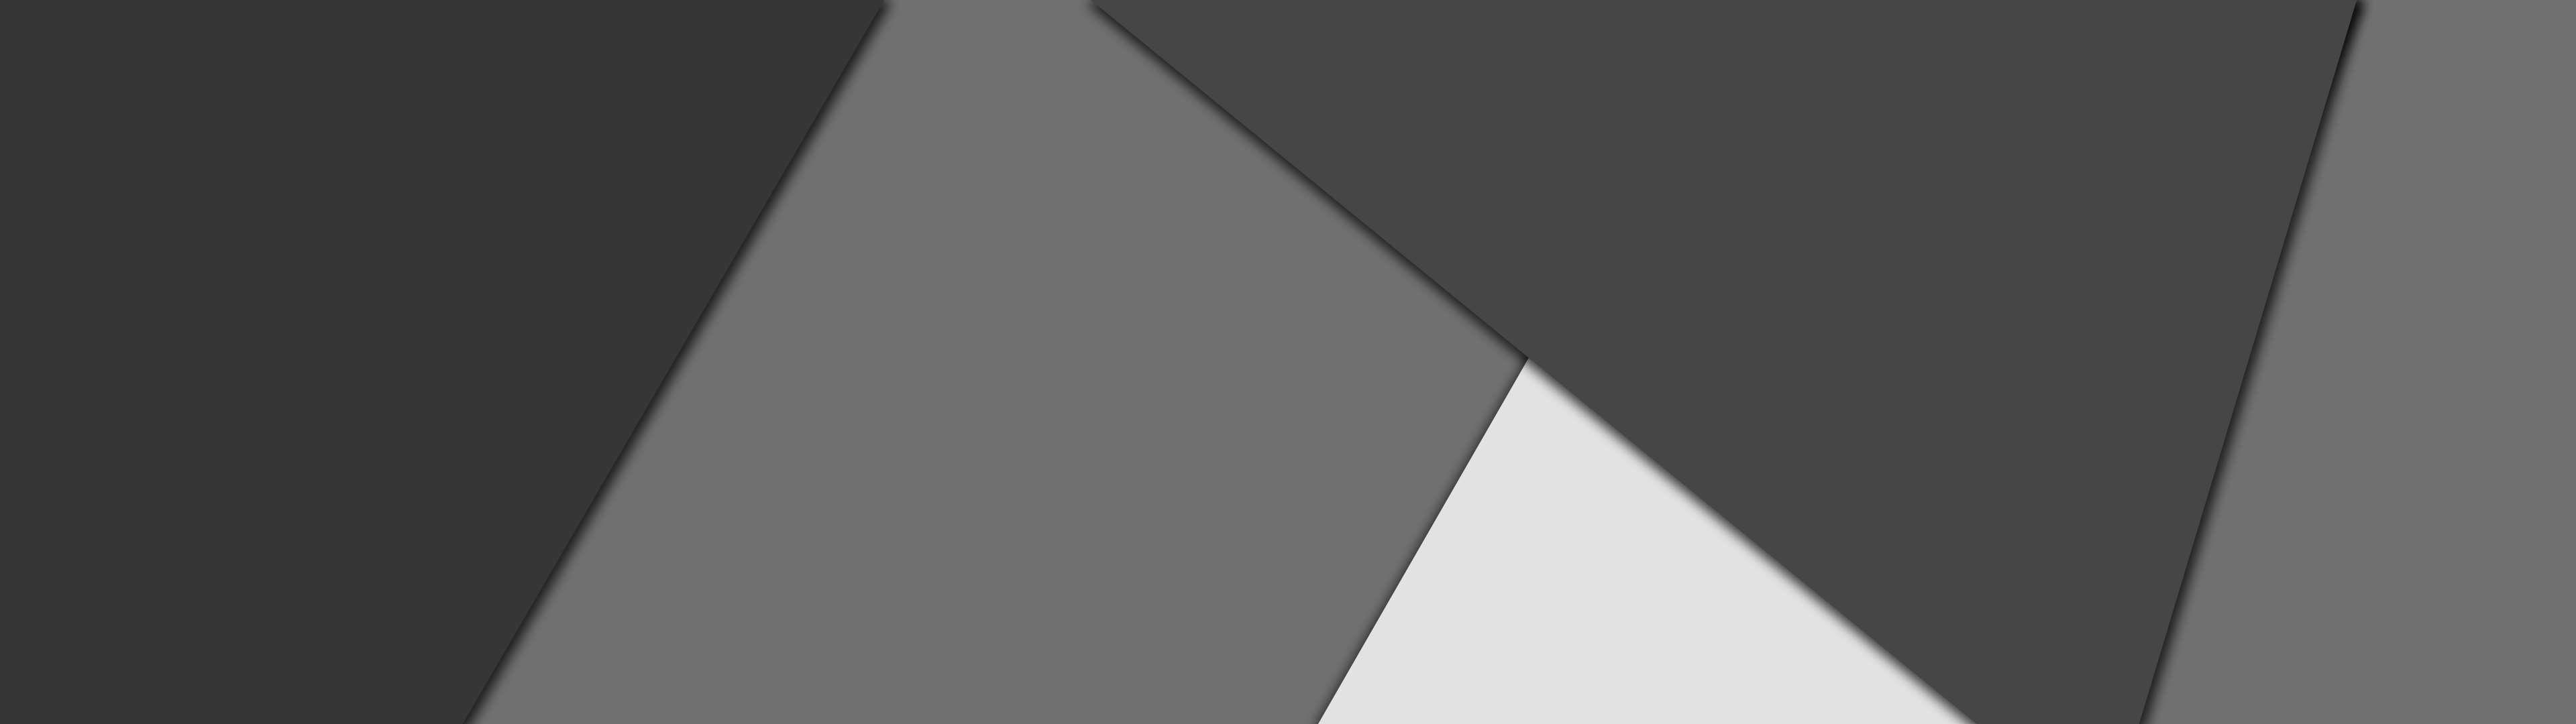 Black Dark Dual 1920x1080 Dual Monitor Grey Metro Moder Modern Simple White 4k Wallpaper Hdwallpaper In 2020 Black Wallpaper Hd Wallpaper Iphone Wallpaper